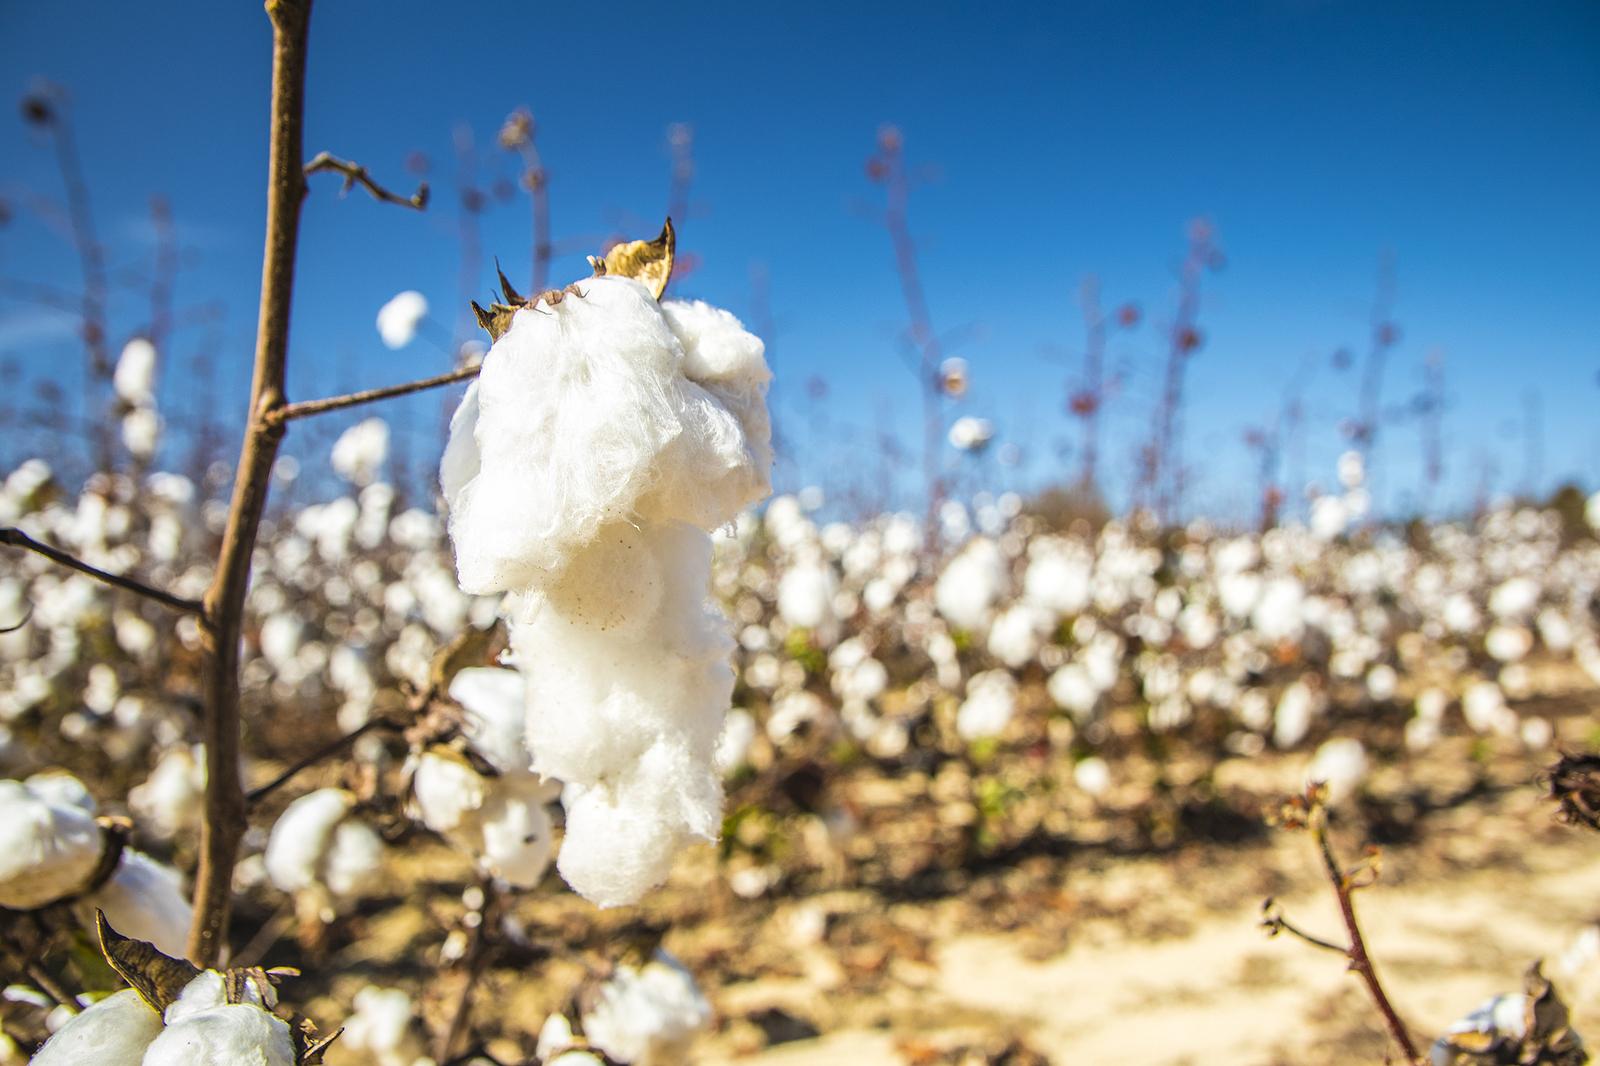 Forced labour still prevalent in Turkmenistan cotton harvest